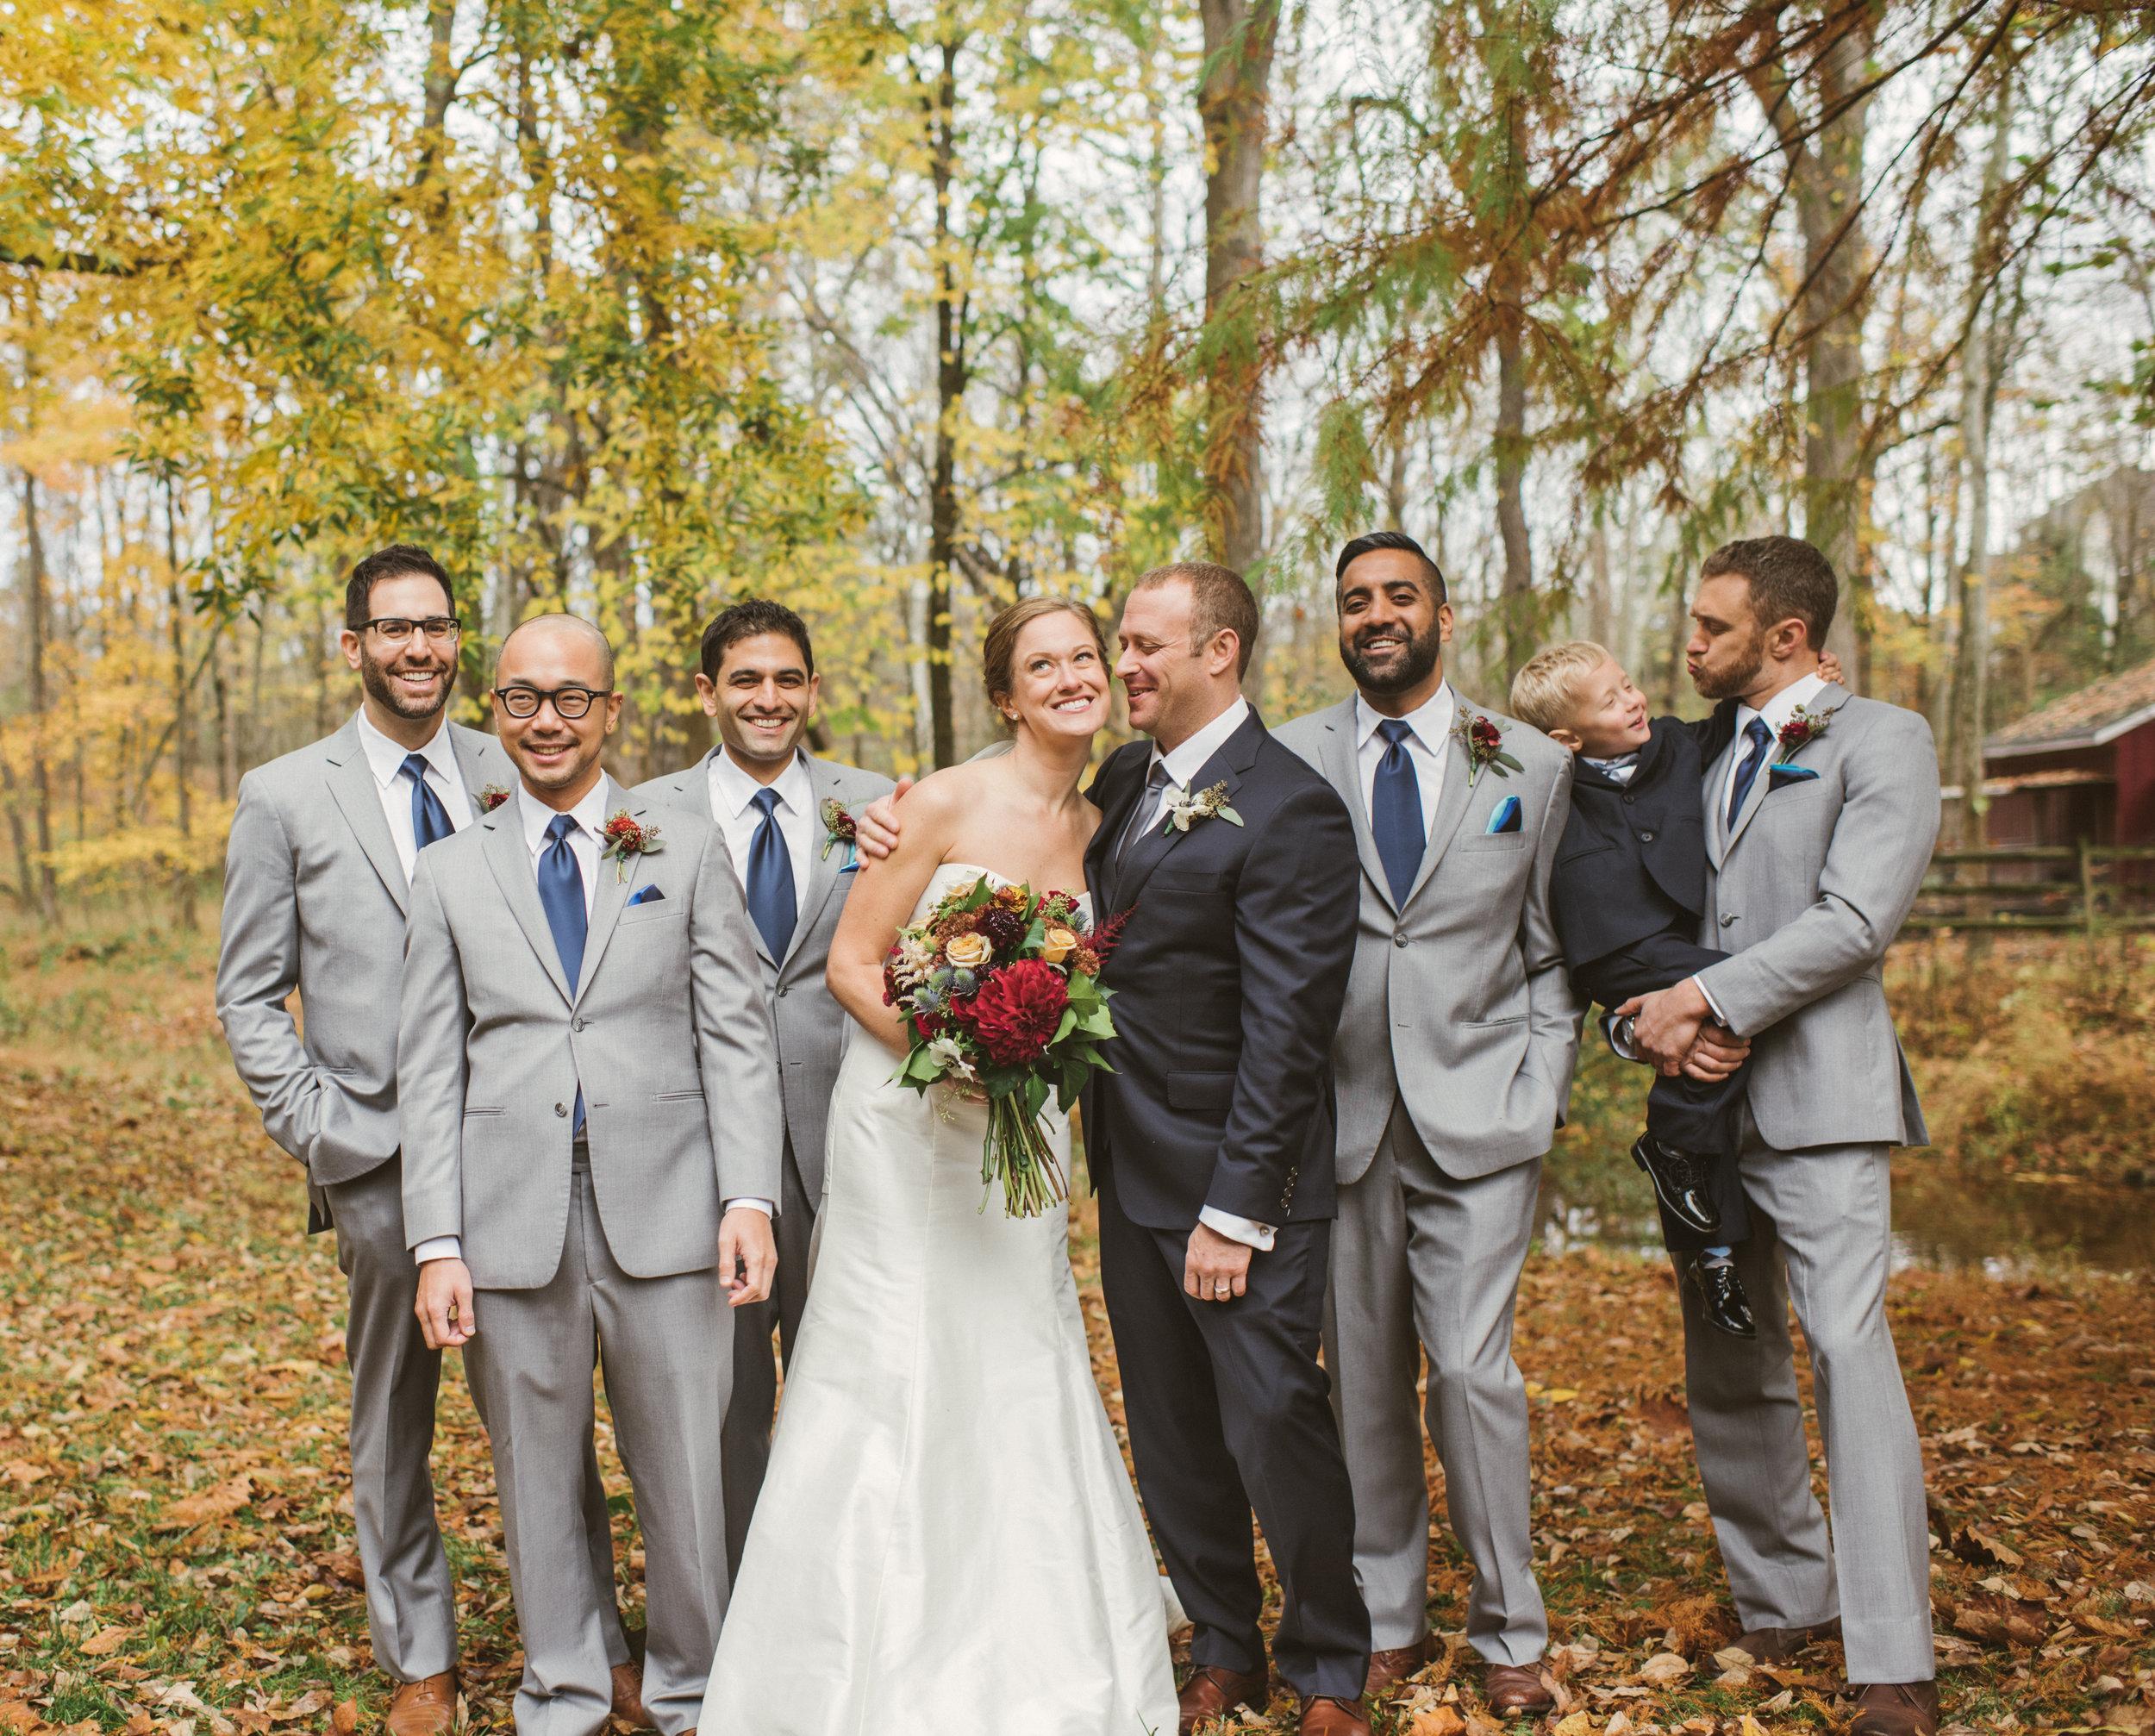 JACQUELINE & ANDREW WARSHAWER -BROOKMILL FARM FALL WEDDING - INTIMATE WEDDING PHOTOGRAPHER - TWOTWENTY by CHI-CHI AGBIM-333.jpg